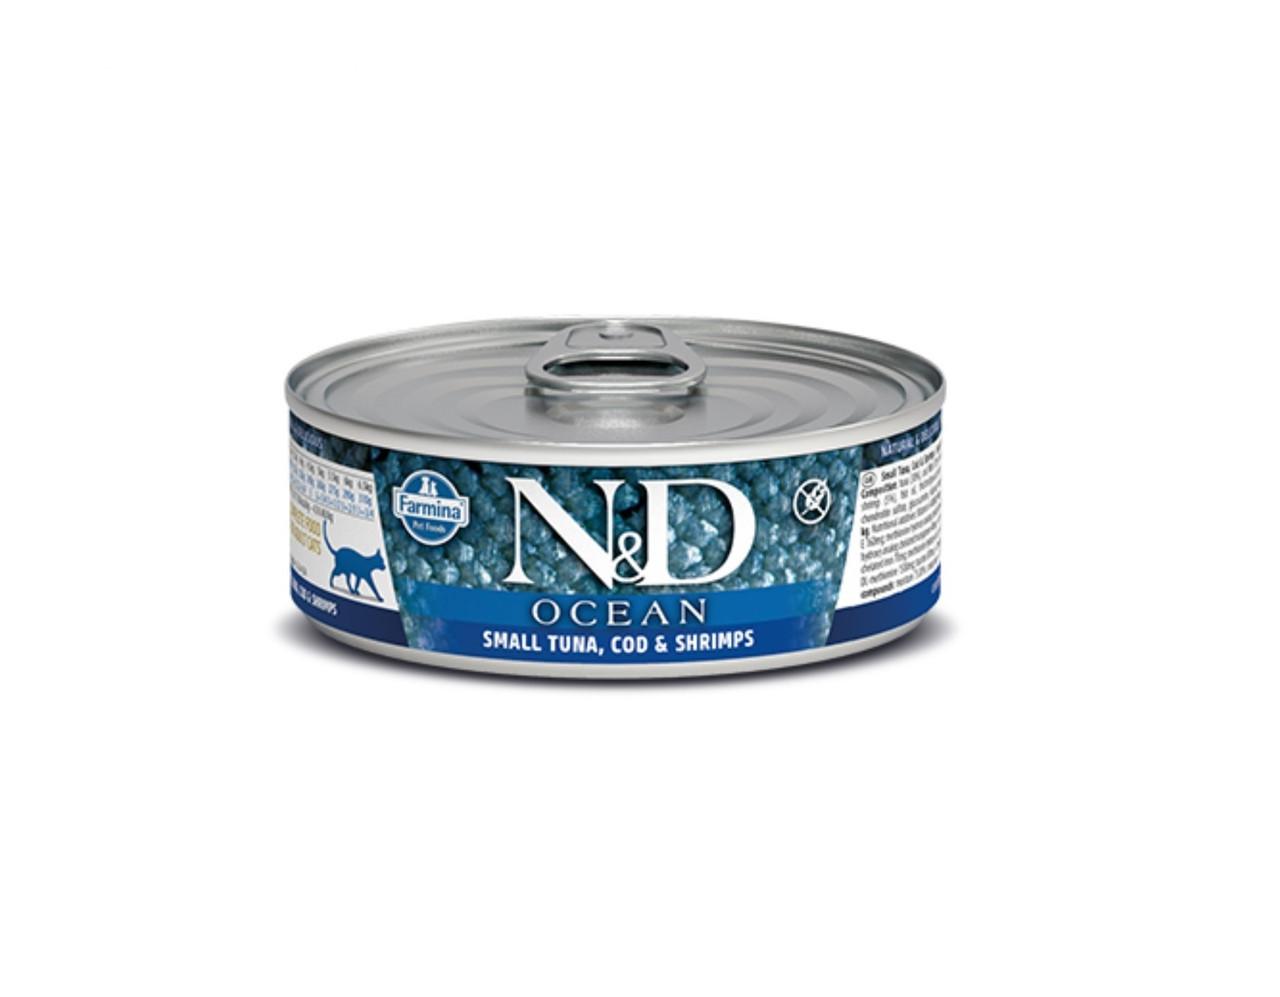 N&D Ocean Kitten для котят, треска, креветки, тыква, банка 80гр.